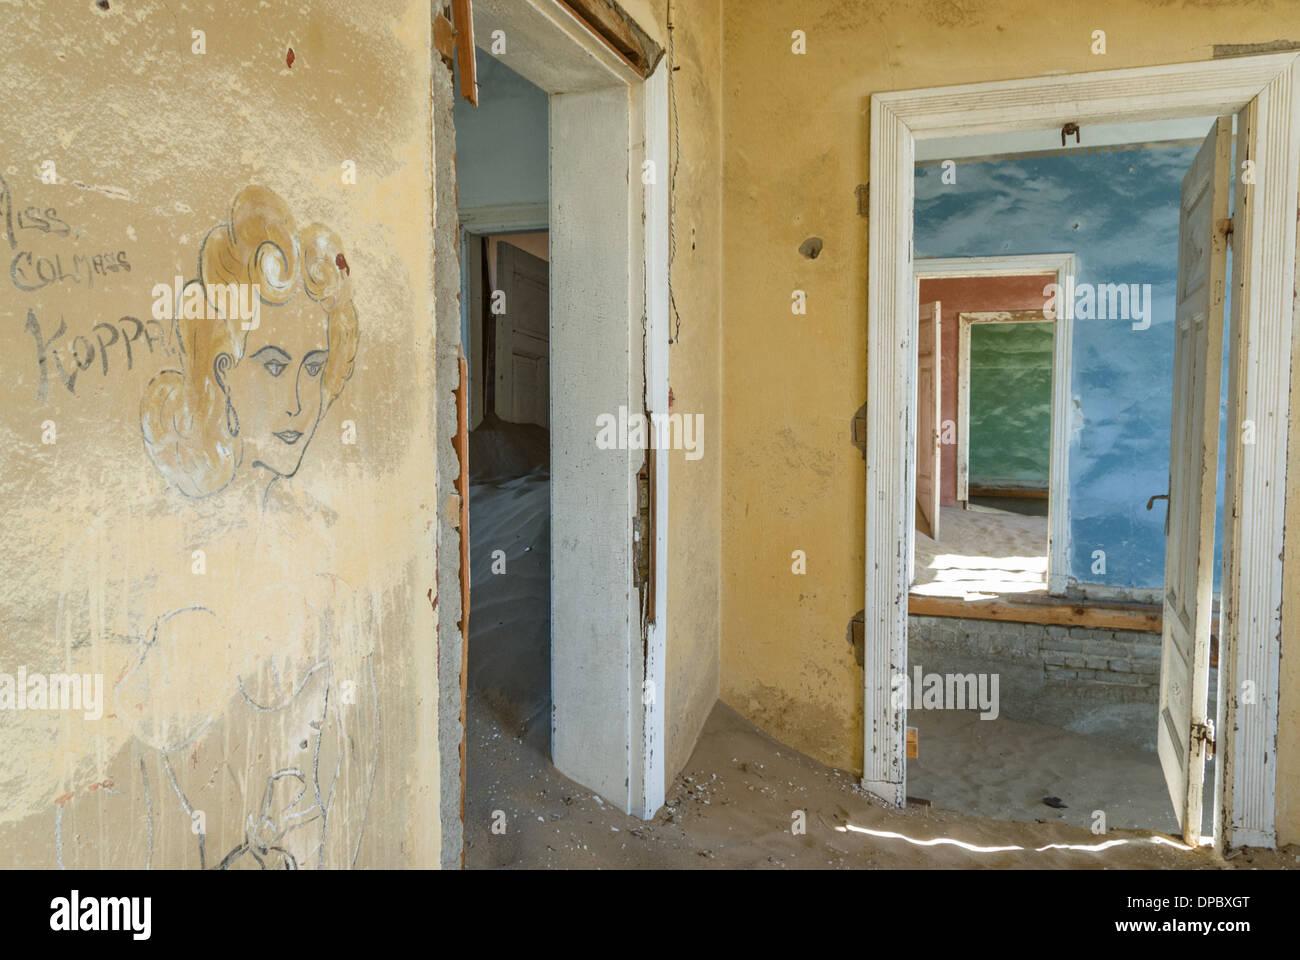 Abandoned house of the old mining town of Kolmanskoppe, Namibia, Africa - Stock Image